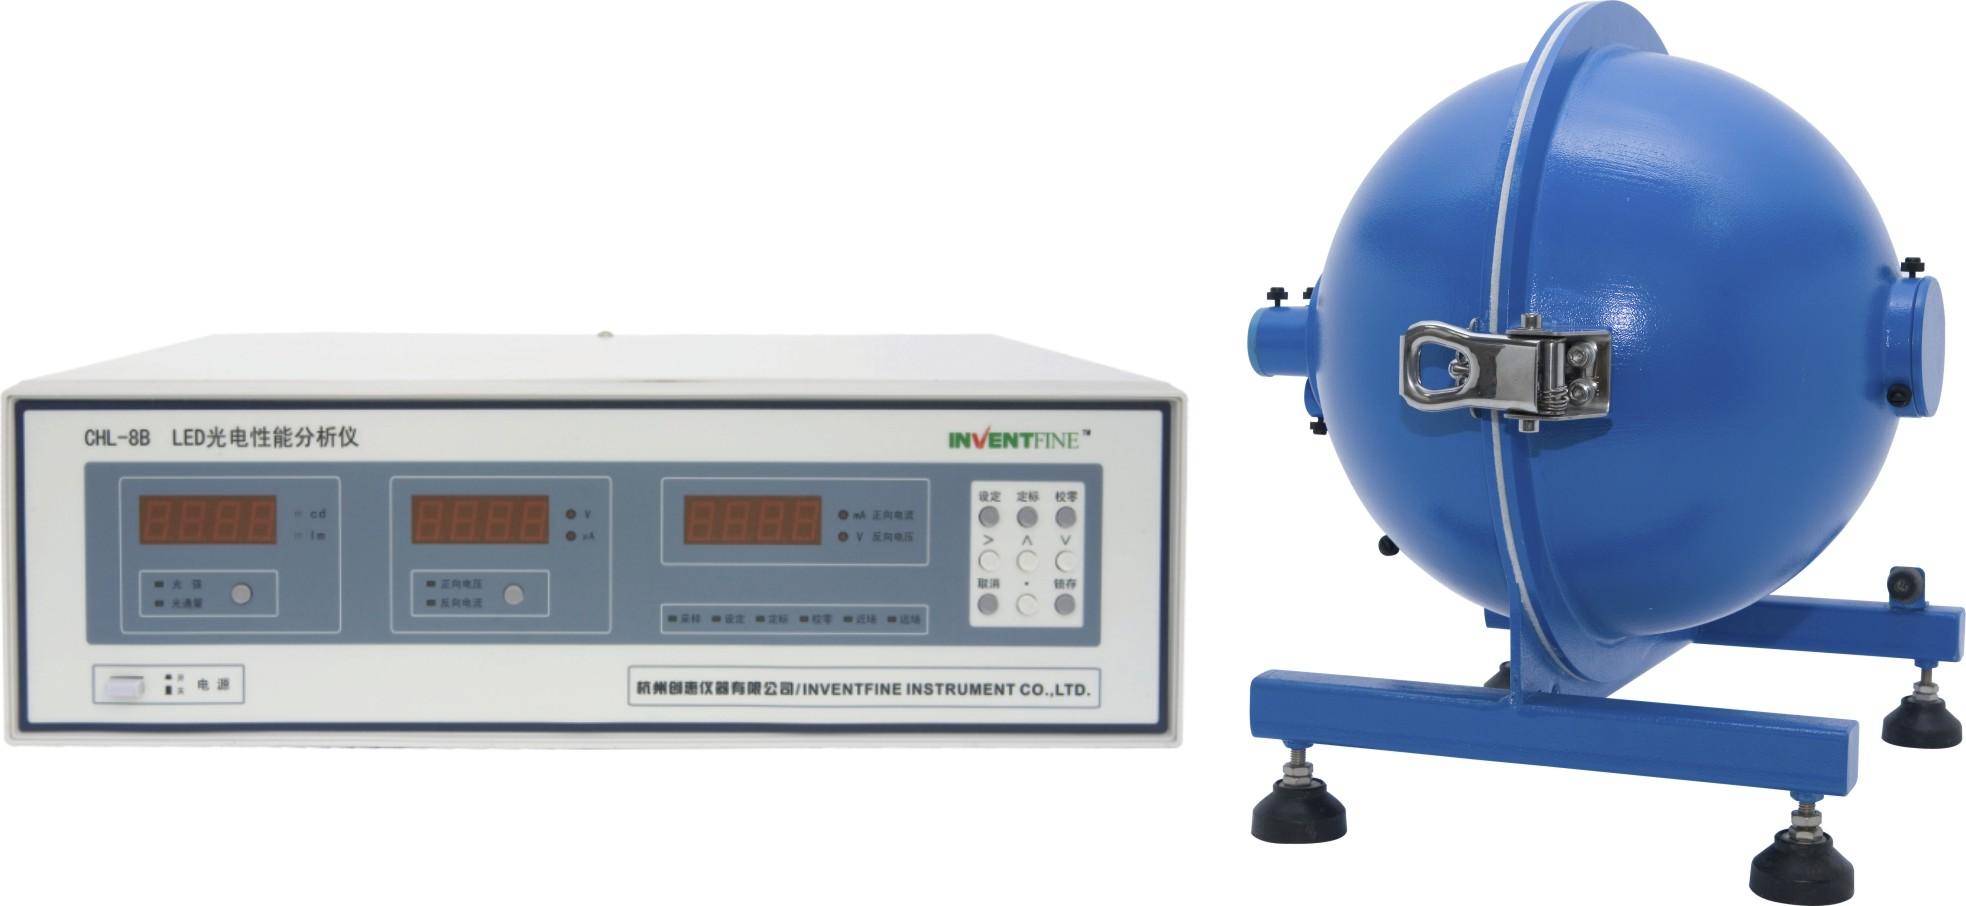 CHL-8B LED光电性能分析仪-2.jpg